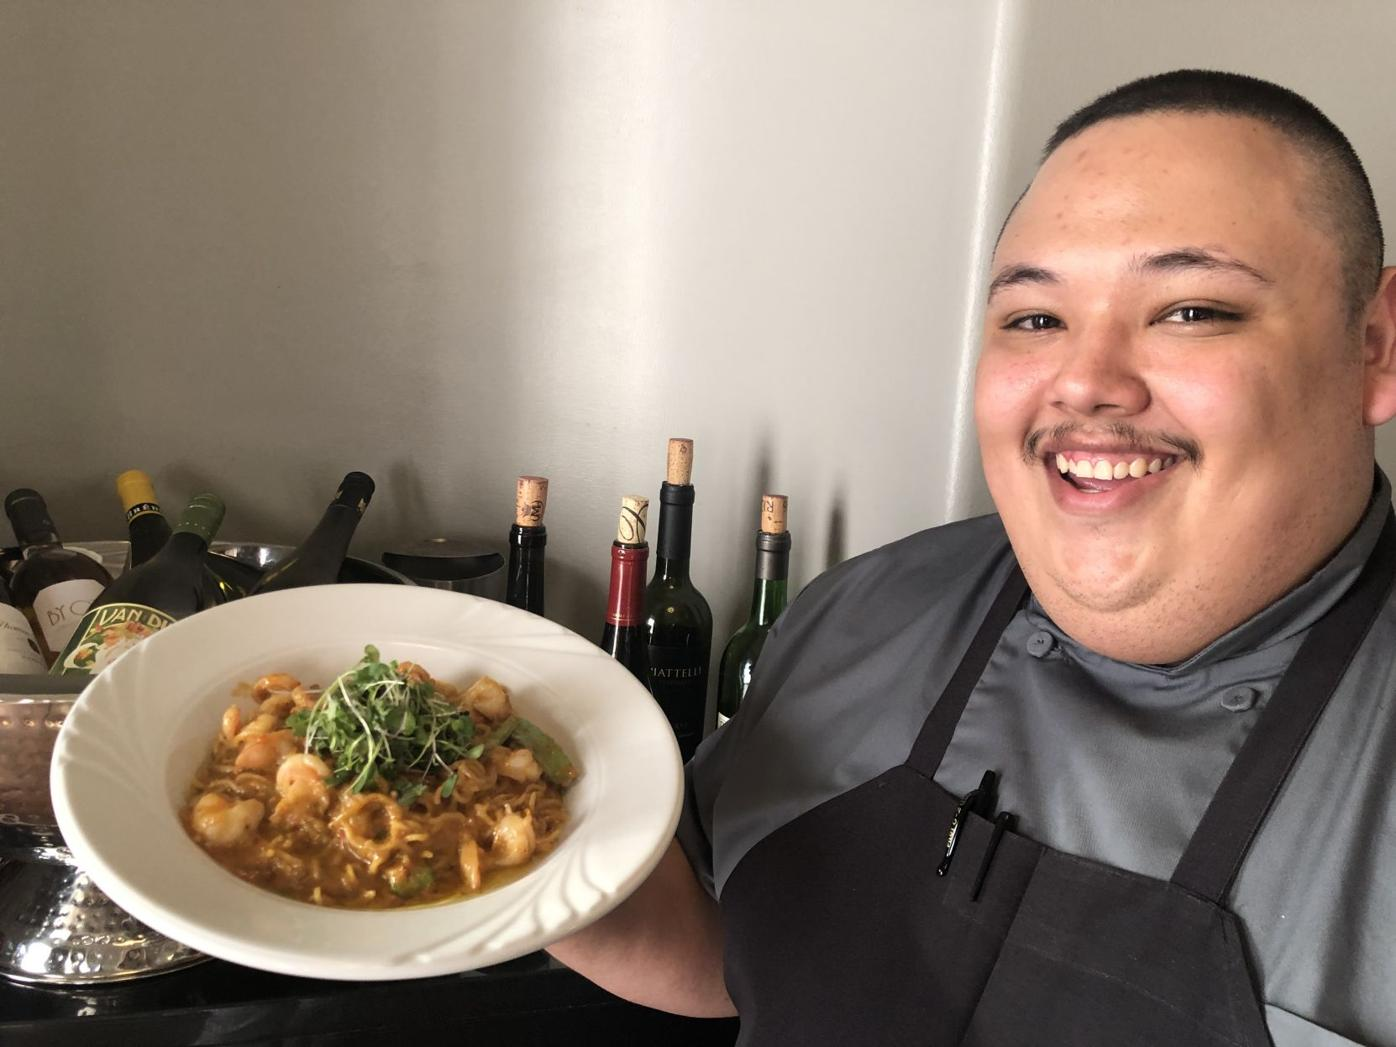 Colorado Springs Fine Arts Center has new executive chef